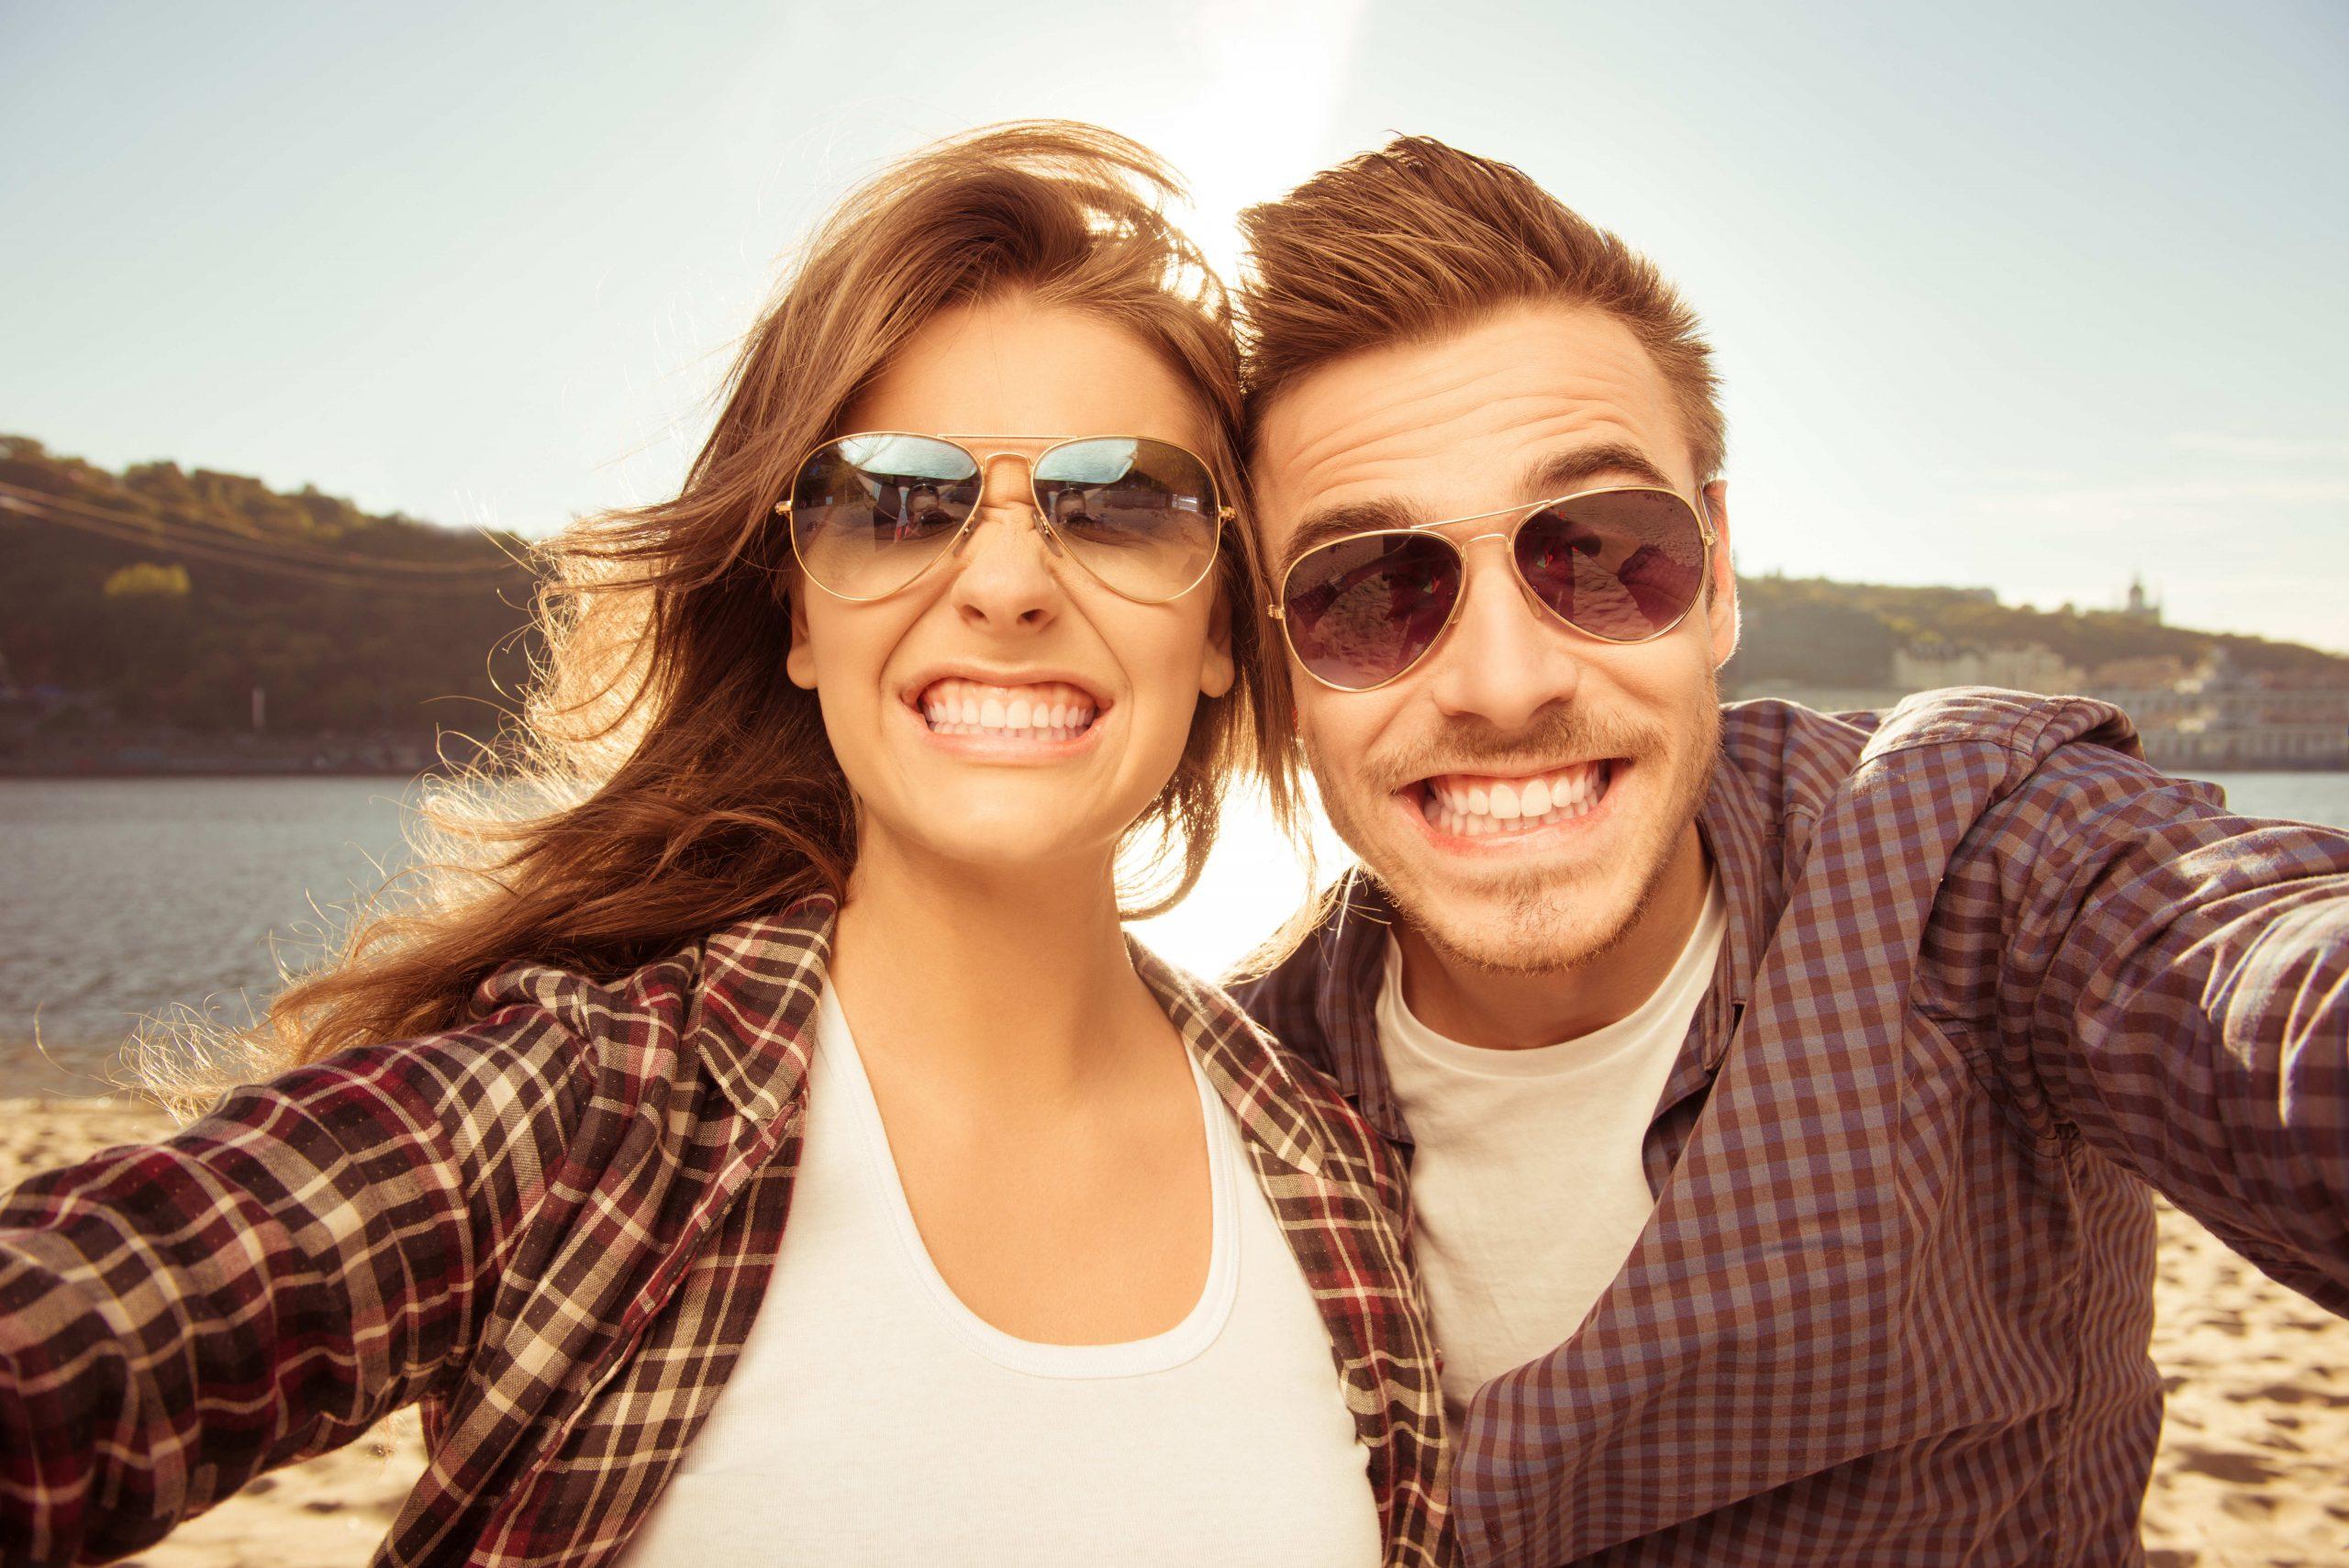 Ortodoncia invisible: cuida tus dientes sin sacrificar tu sonrisa